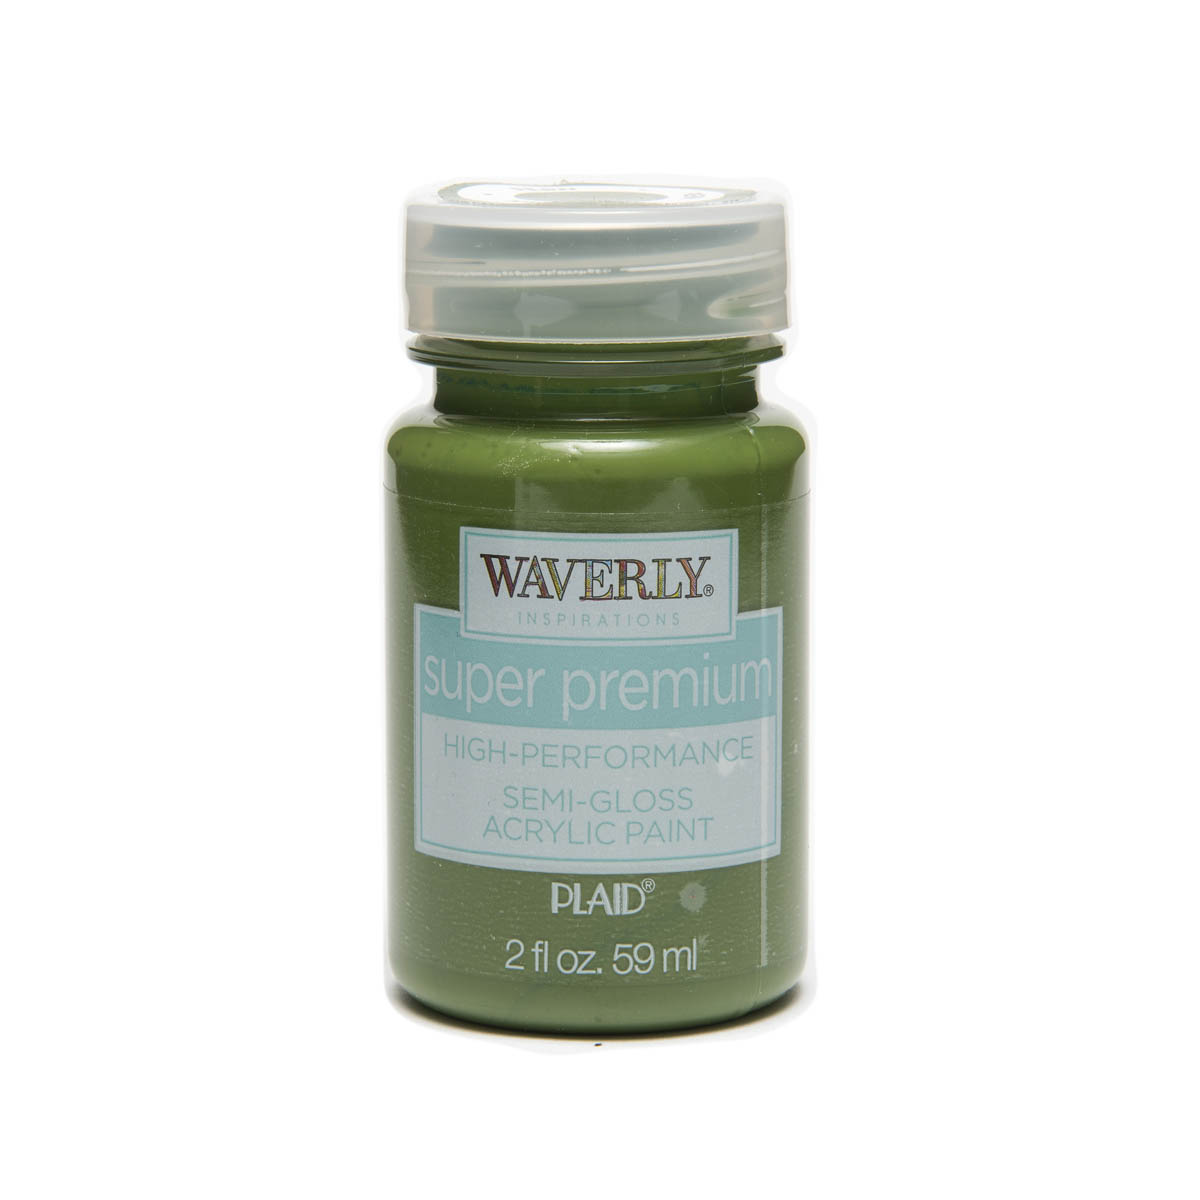 Waverly ® Inspirations Super Premium Semi-Gloss Acrylic Paint - Fern, 2 oz.